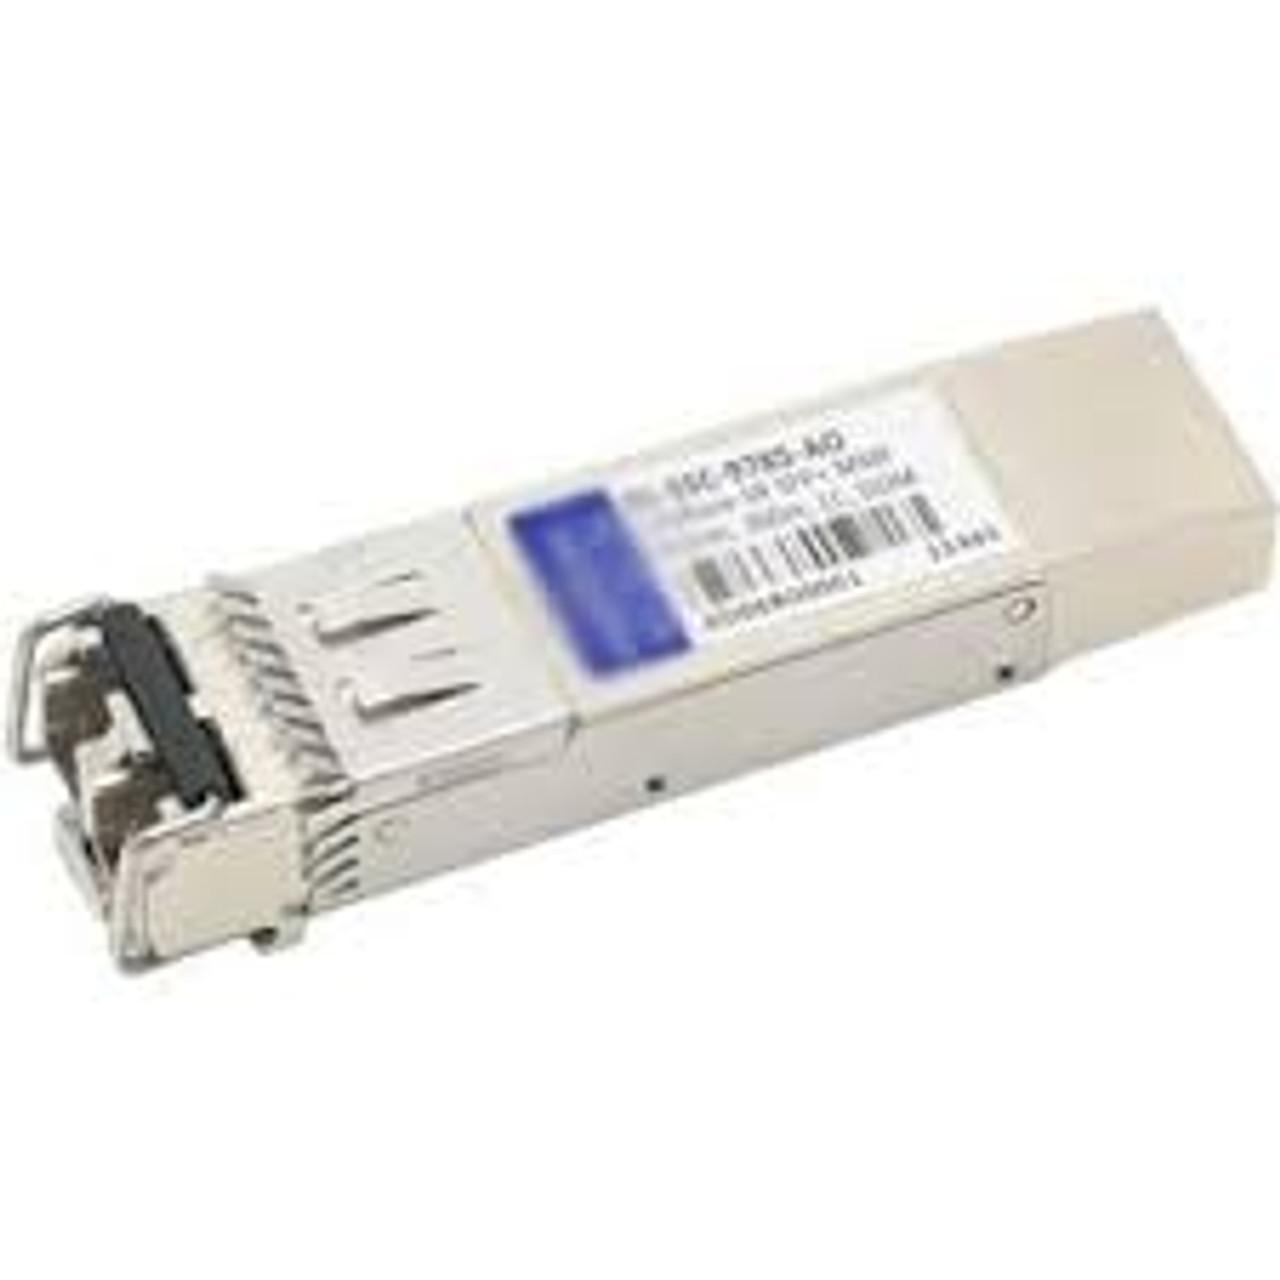 10GB-LR SFP+ LONG REACH FIBER MODULE SINGLE-MODE NO CABLE